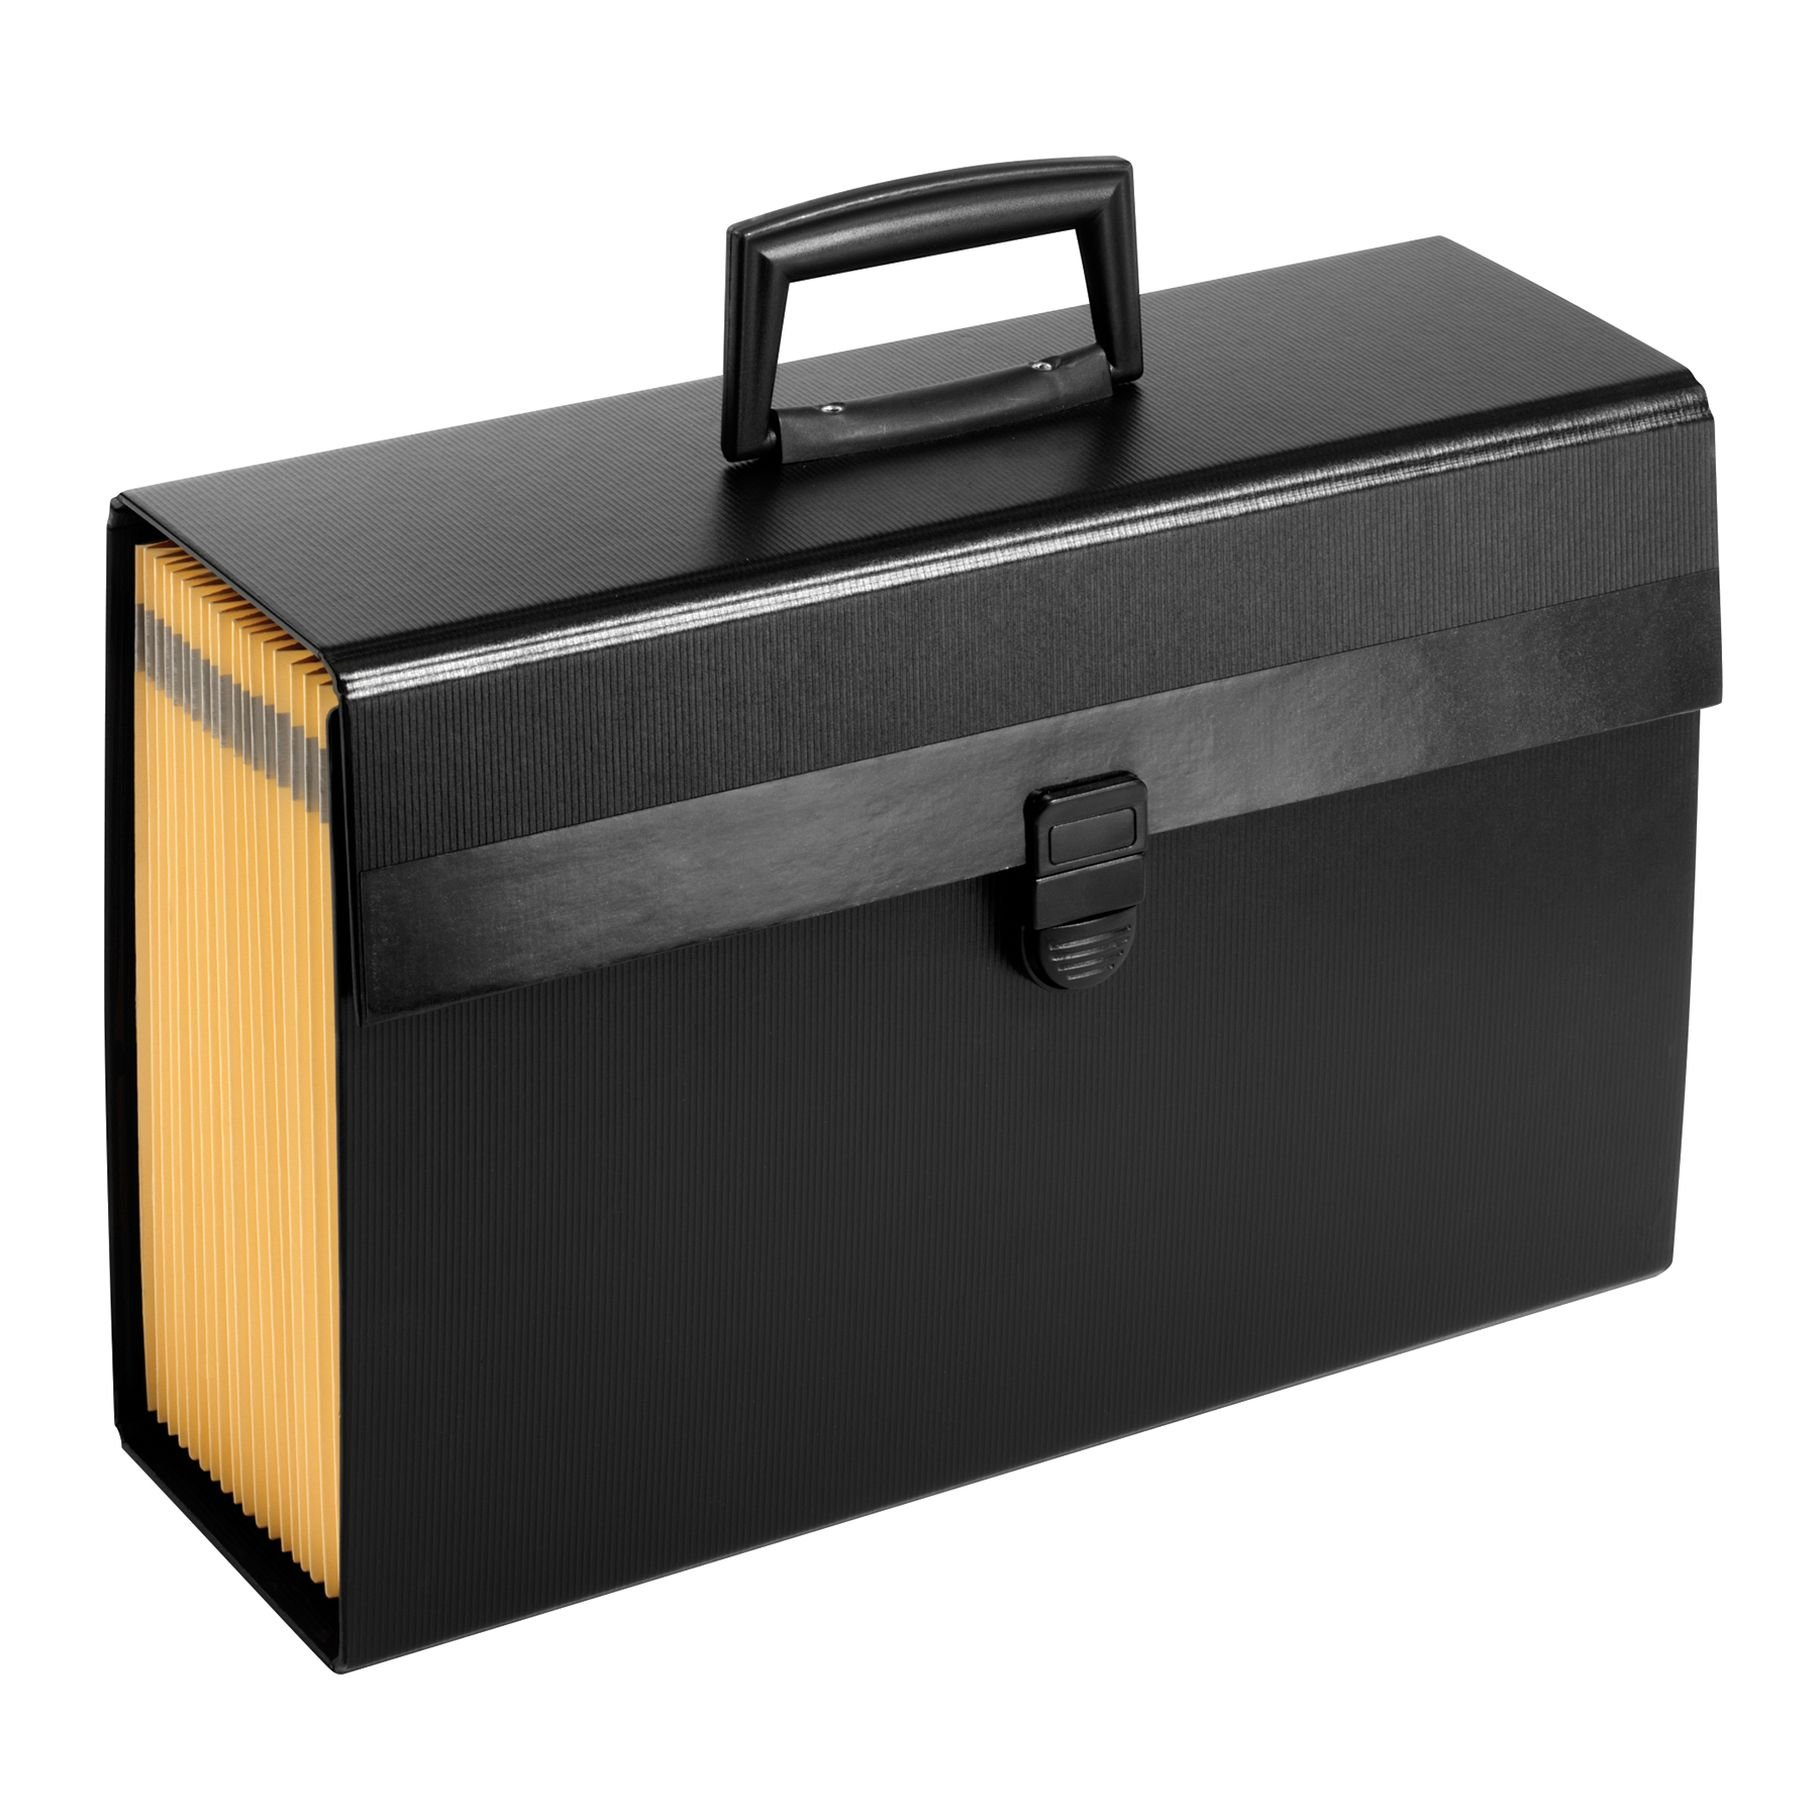 Pendaflex Portafile Expanding Organizer, 15 1/8''x 10 5/8'', Black (01156)